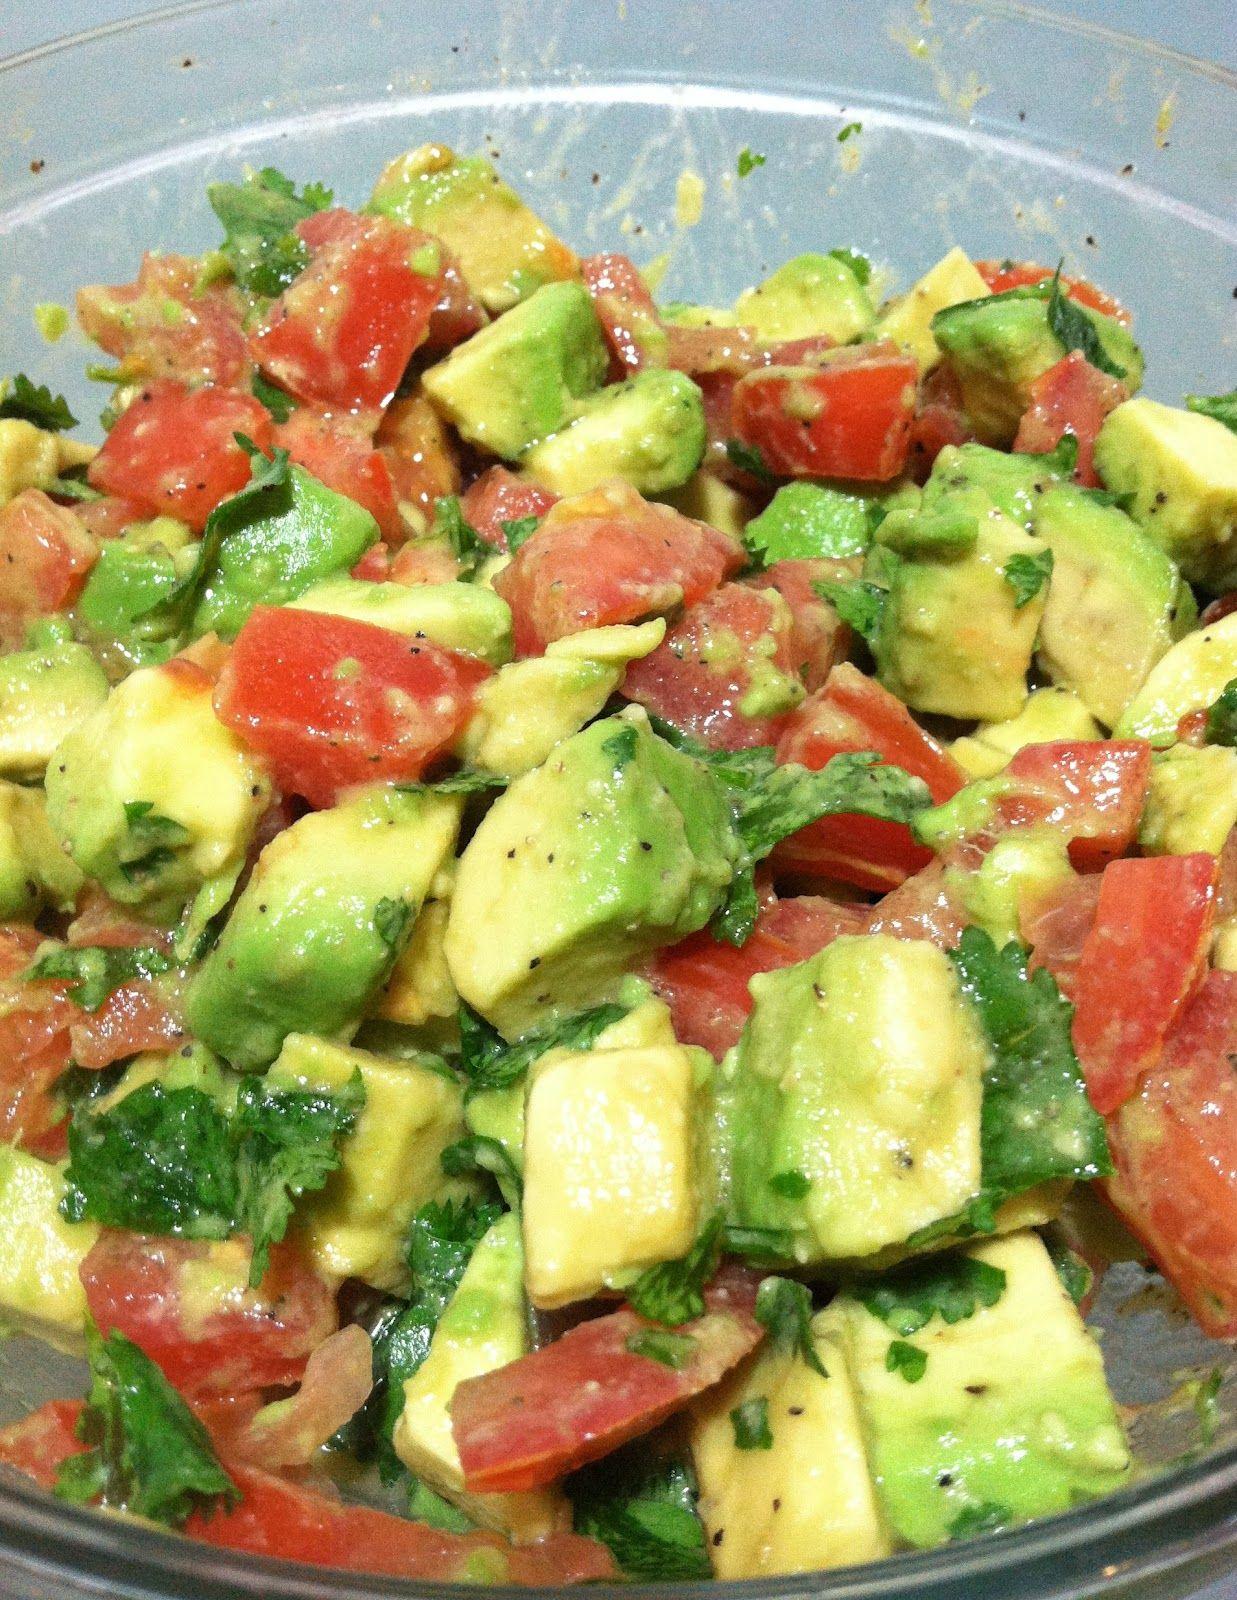 Avocado Tomato Salad. I make this a lot. I make mine with just salt, pepper & Balsamic vinegar.